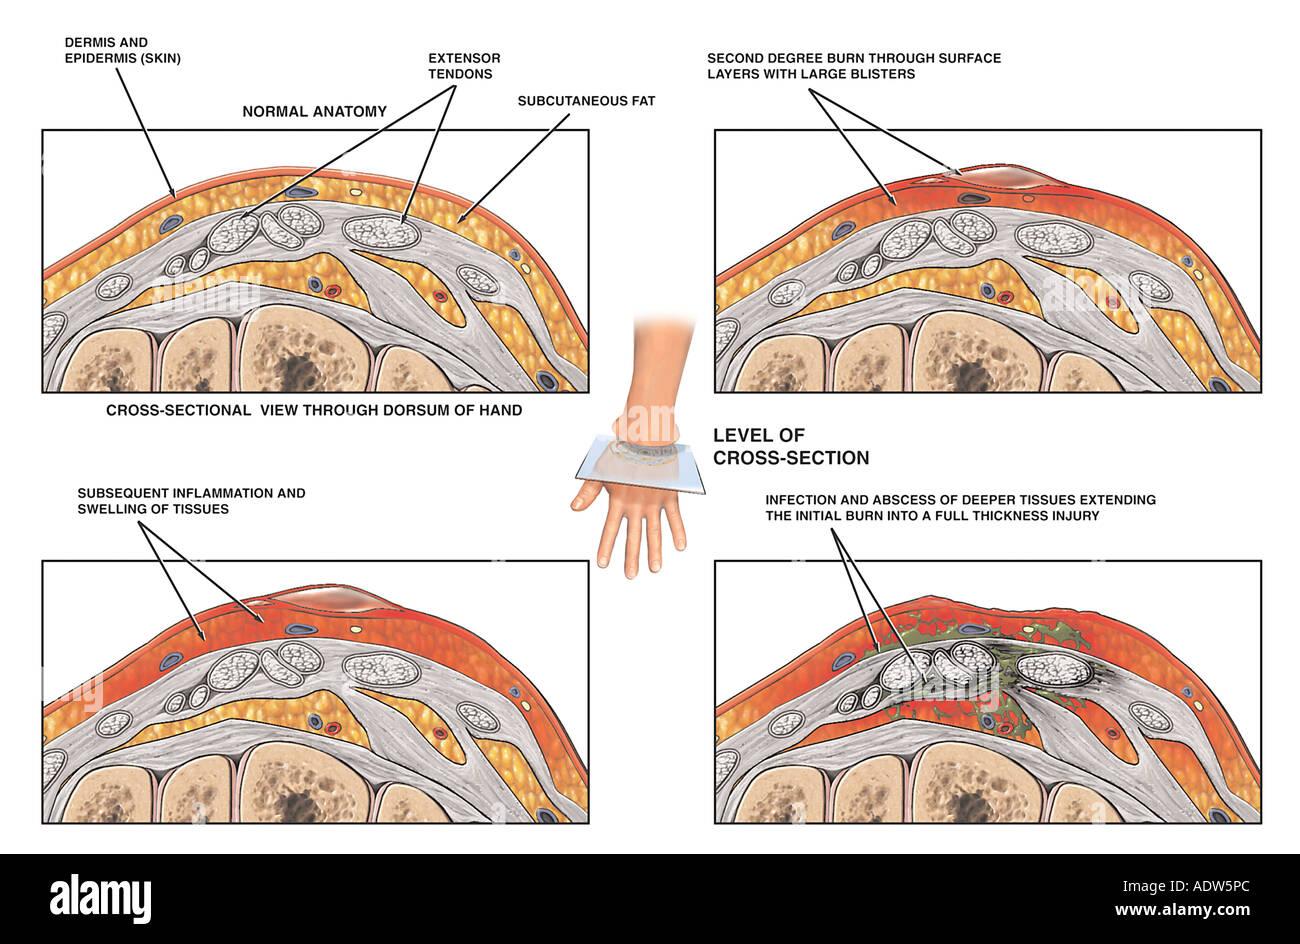 Progression of Left Hand Burn - Stock Image